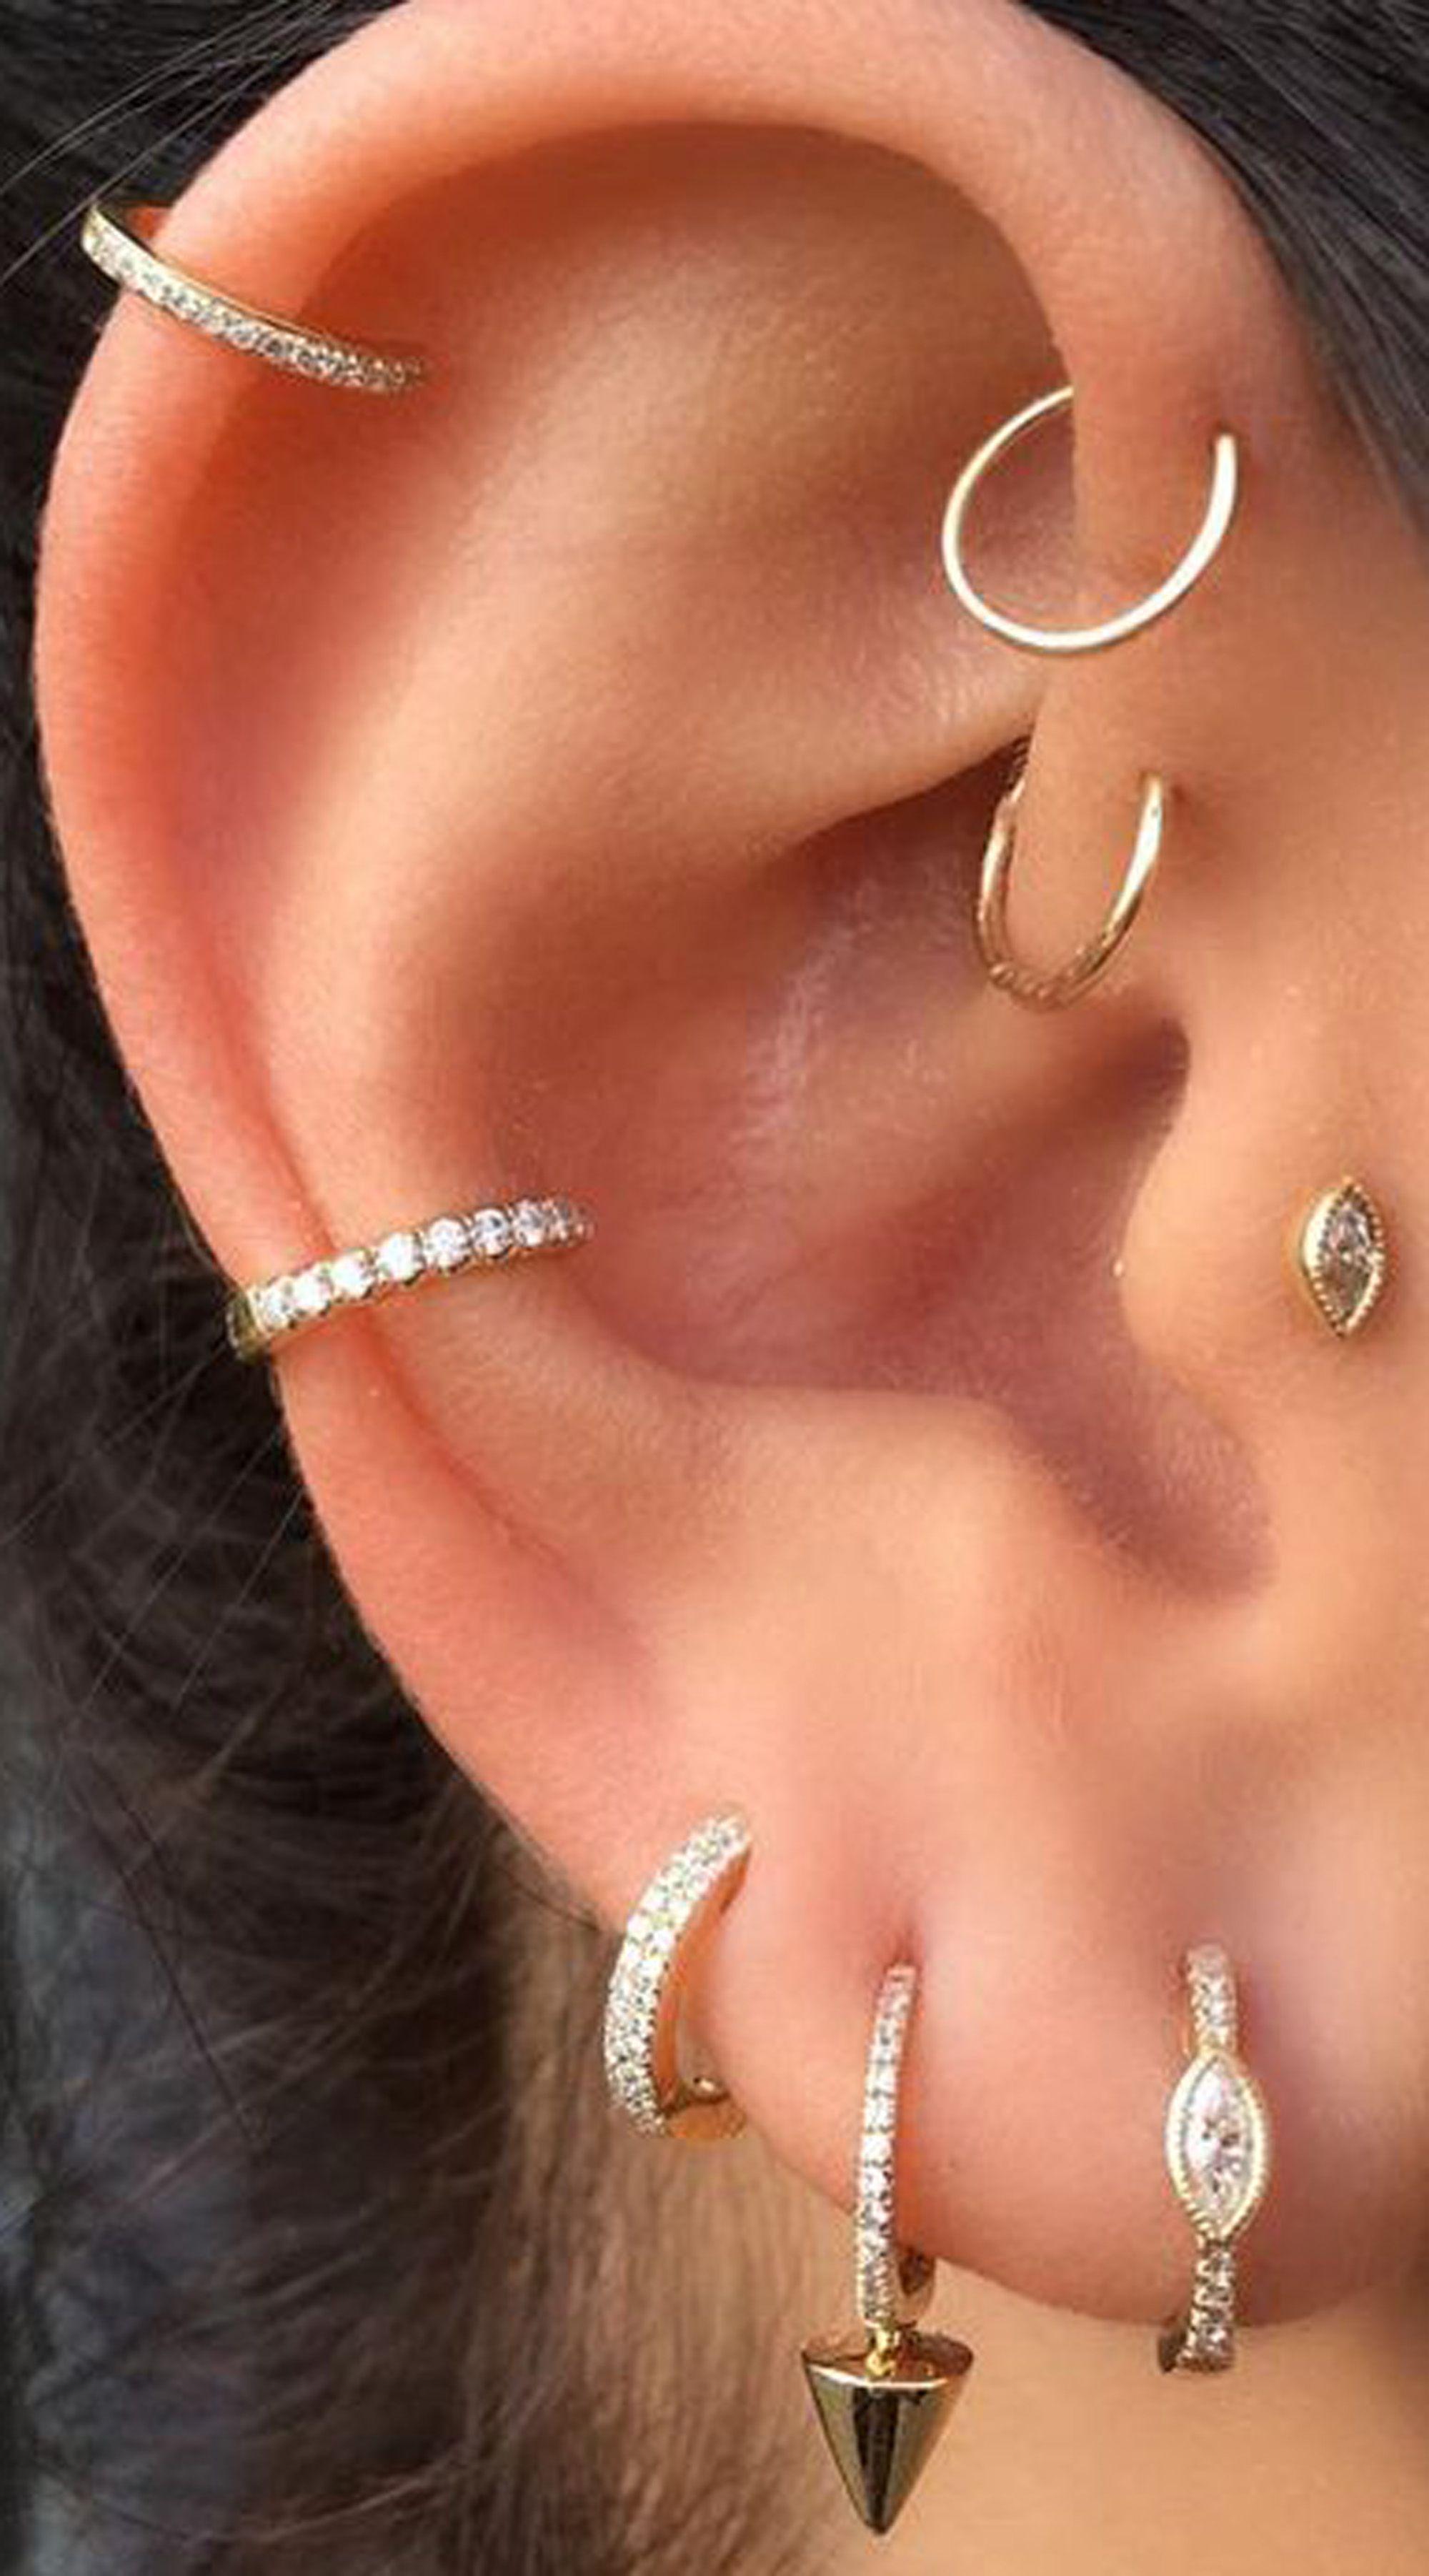 ba1d8225e0898 cute multiple ear piercings crystal cartilage ring hoop jewelry 16g ...